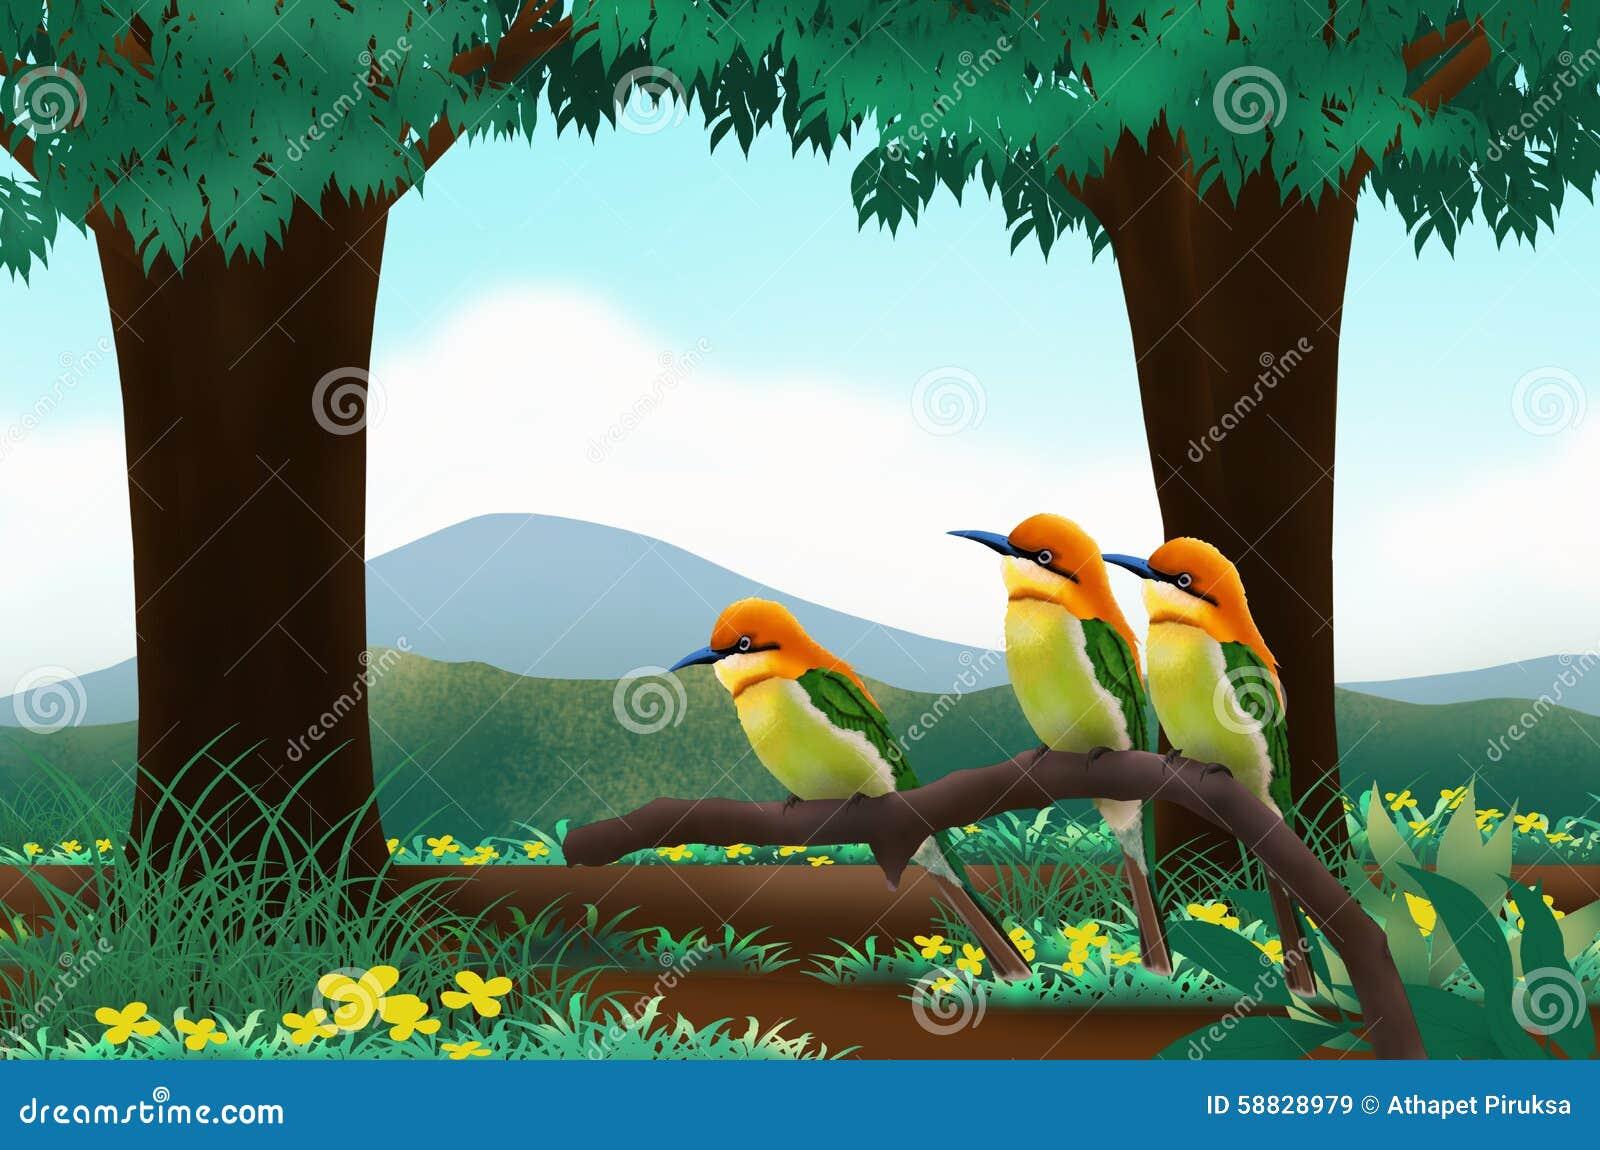 Birds In The Forest Stock Illustration. Illustration Of